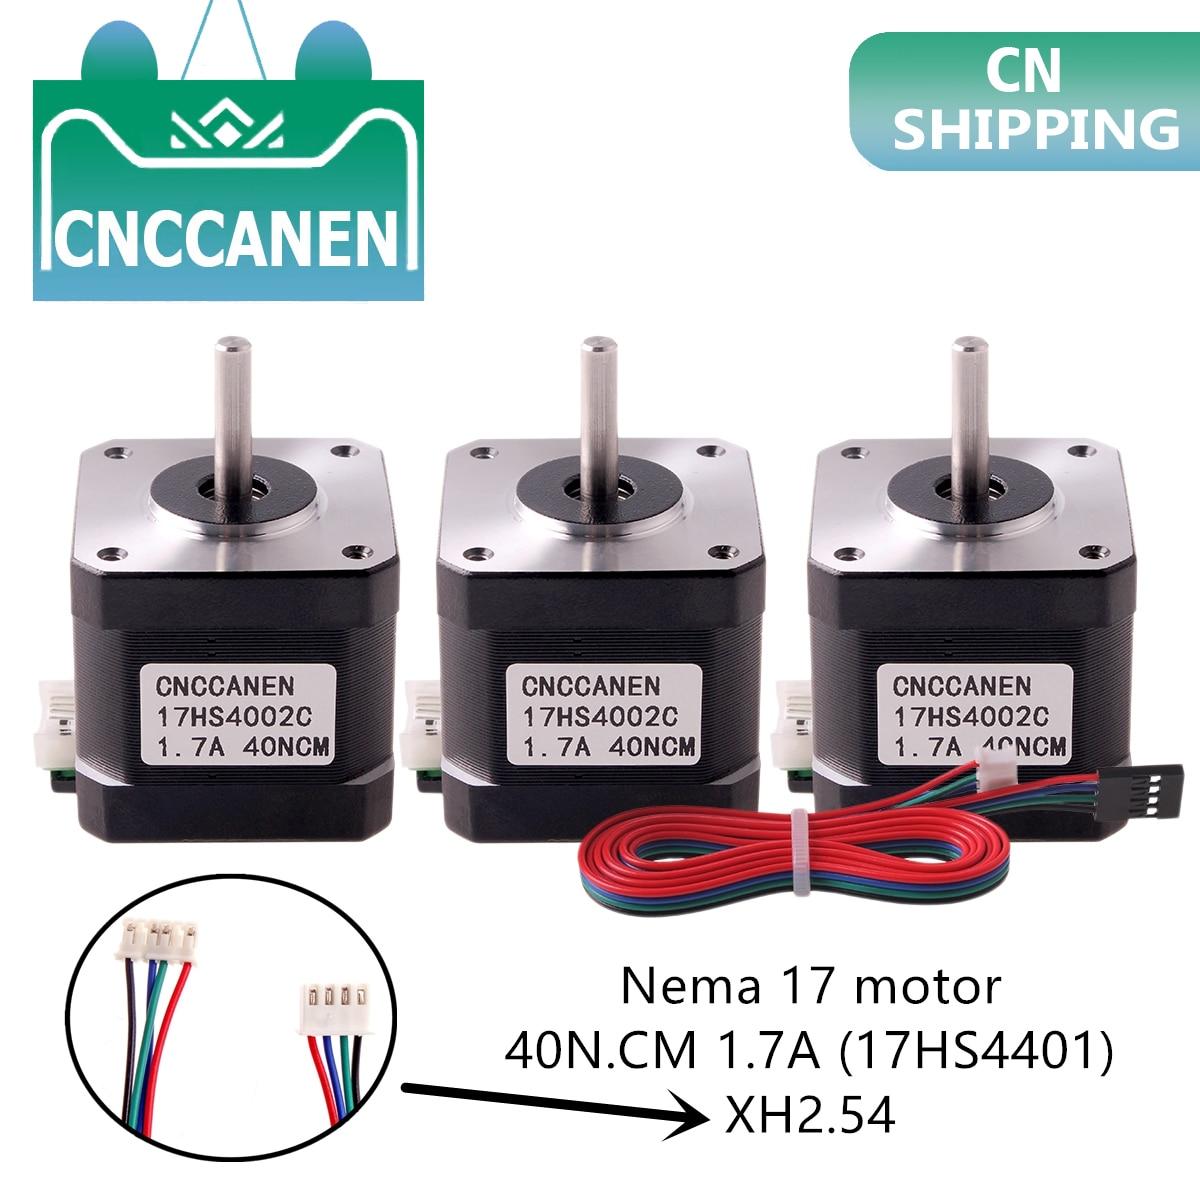 1/3/5PCS Nema17 Stepper Motor 42 Motor Nema 17 Motor 40mm 1.7A (17HS4401) Motor 4-lead For 3D Printer XH2.54